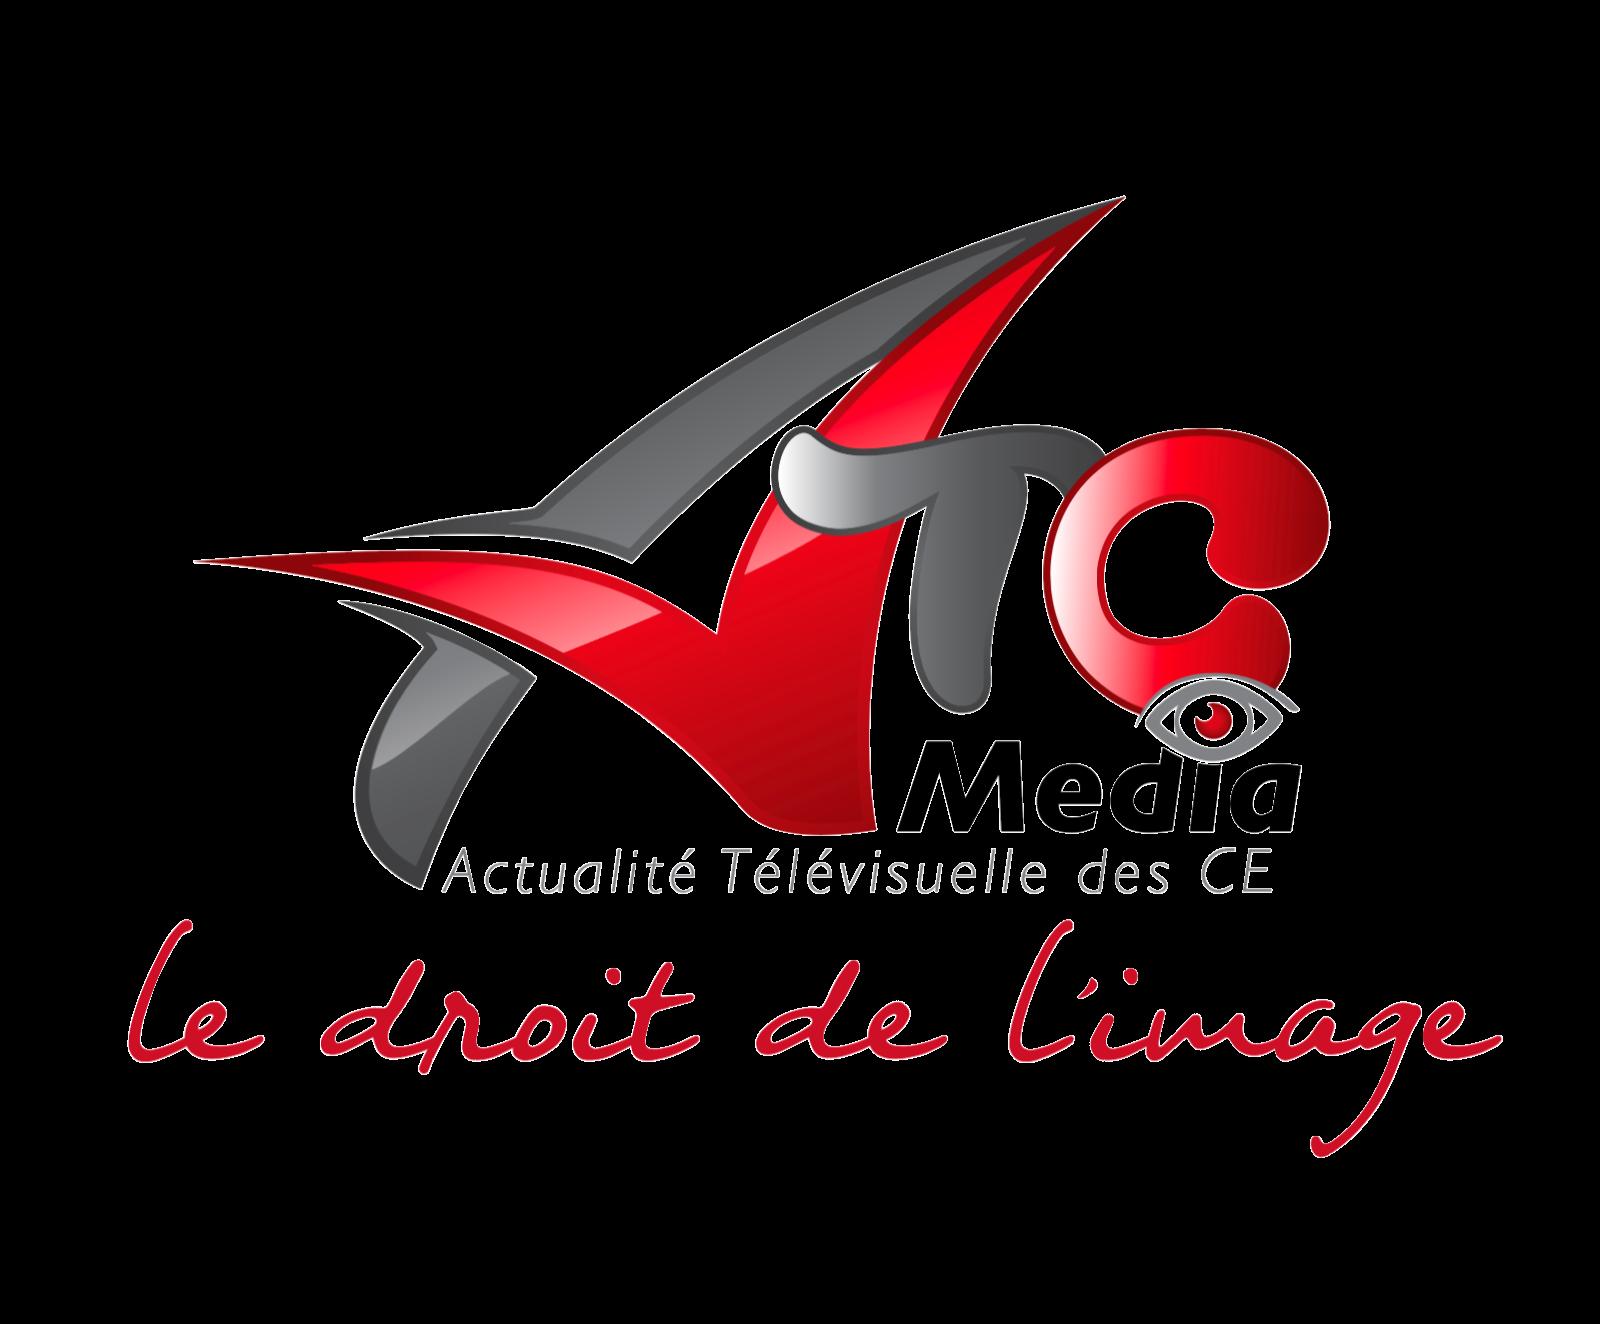 Atc Média